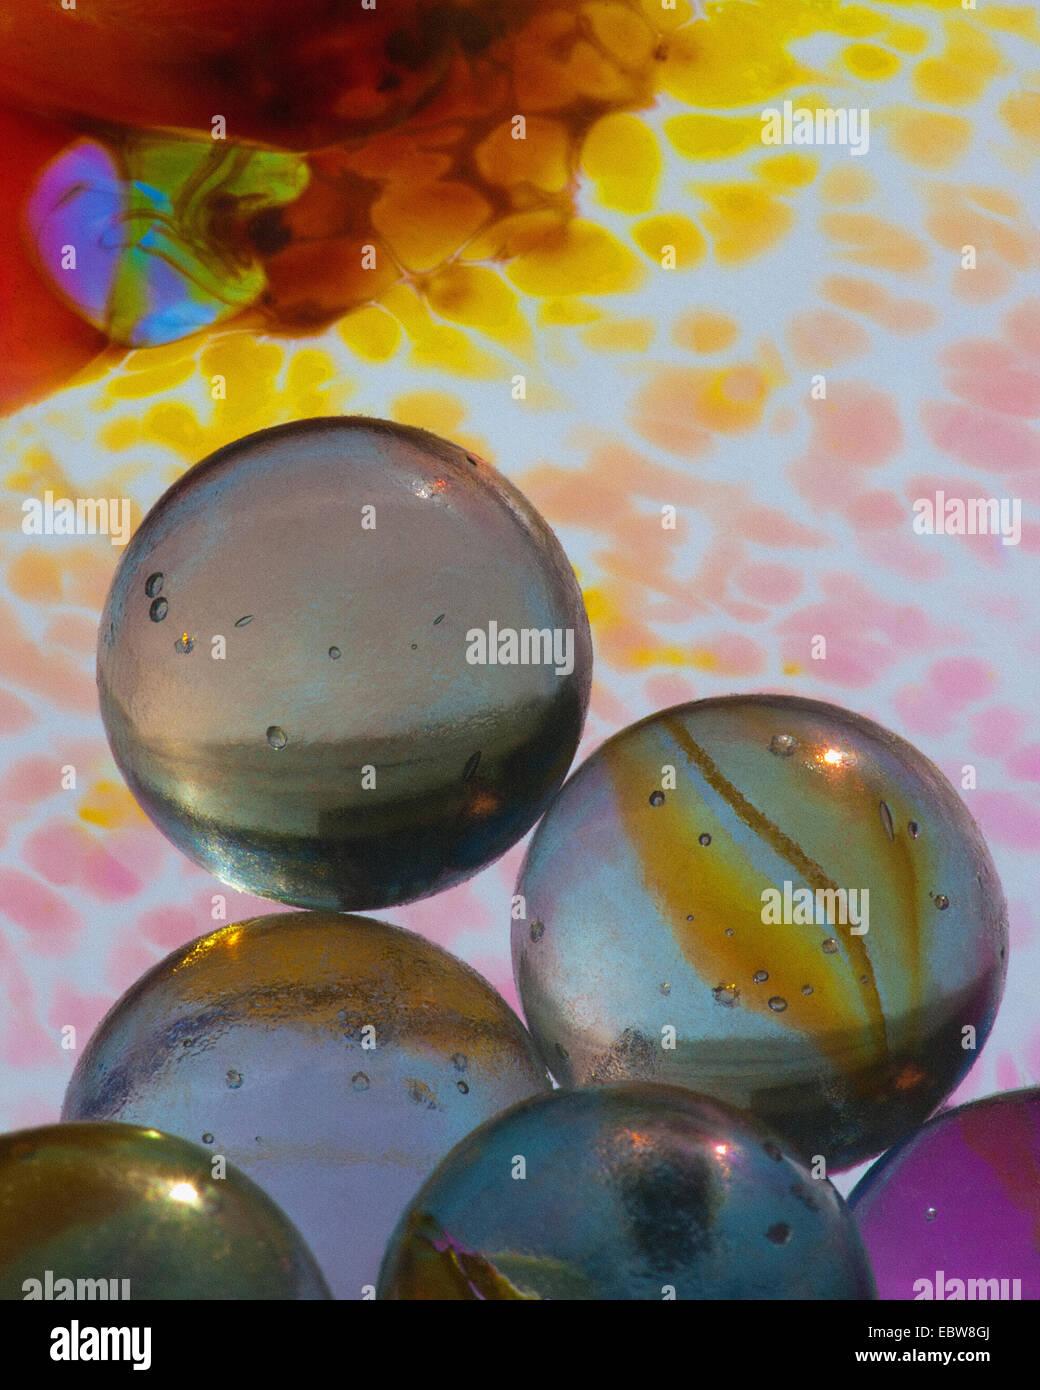 Arte fotográfico: Concepto de vidrio Imagen De Stock